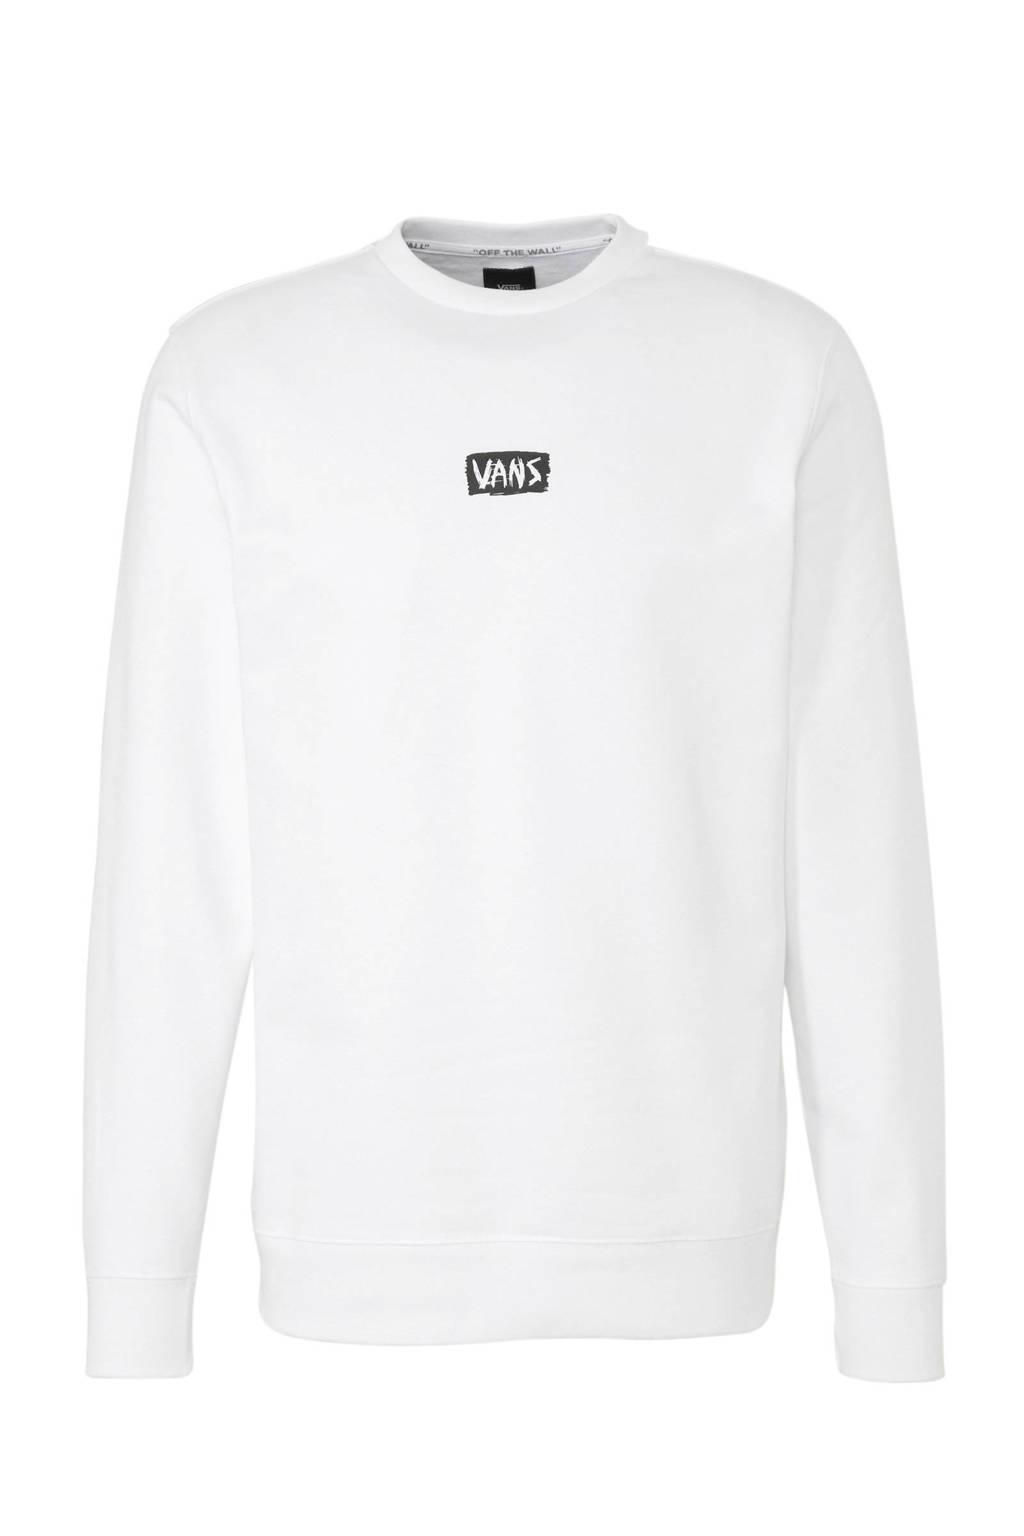 VANS   sweater wit, Wit